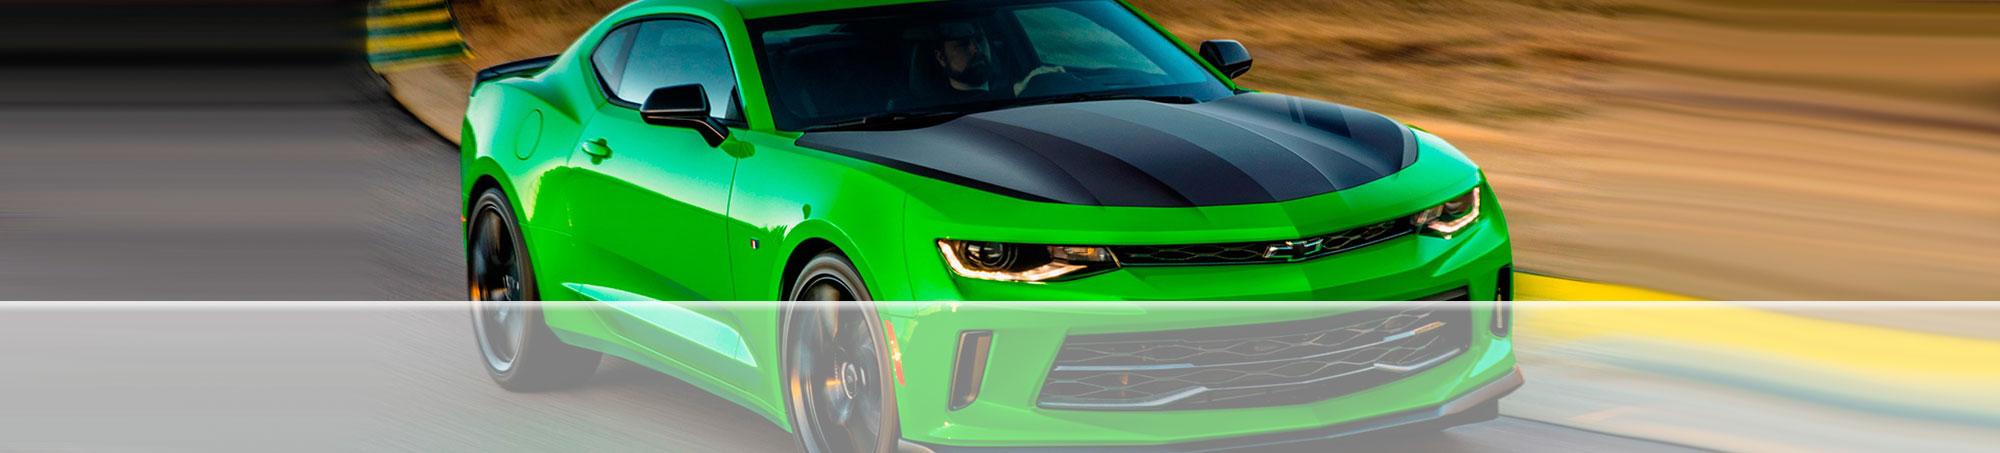 FRS AUTO LLC - Used Cars - West Palm Beach FL Dealer